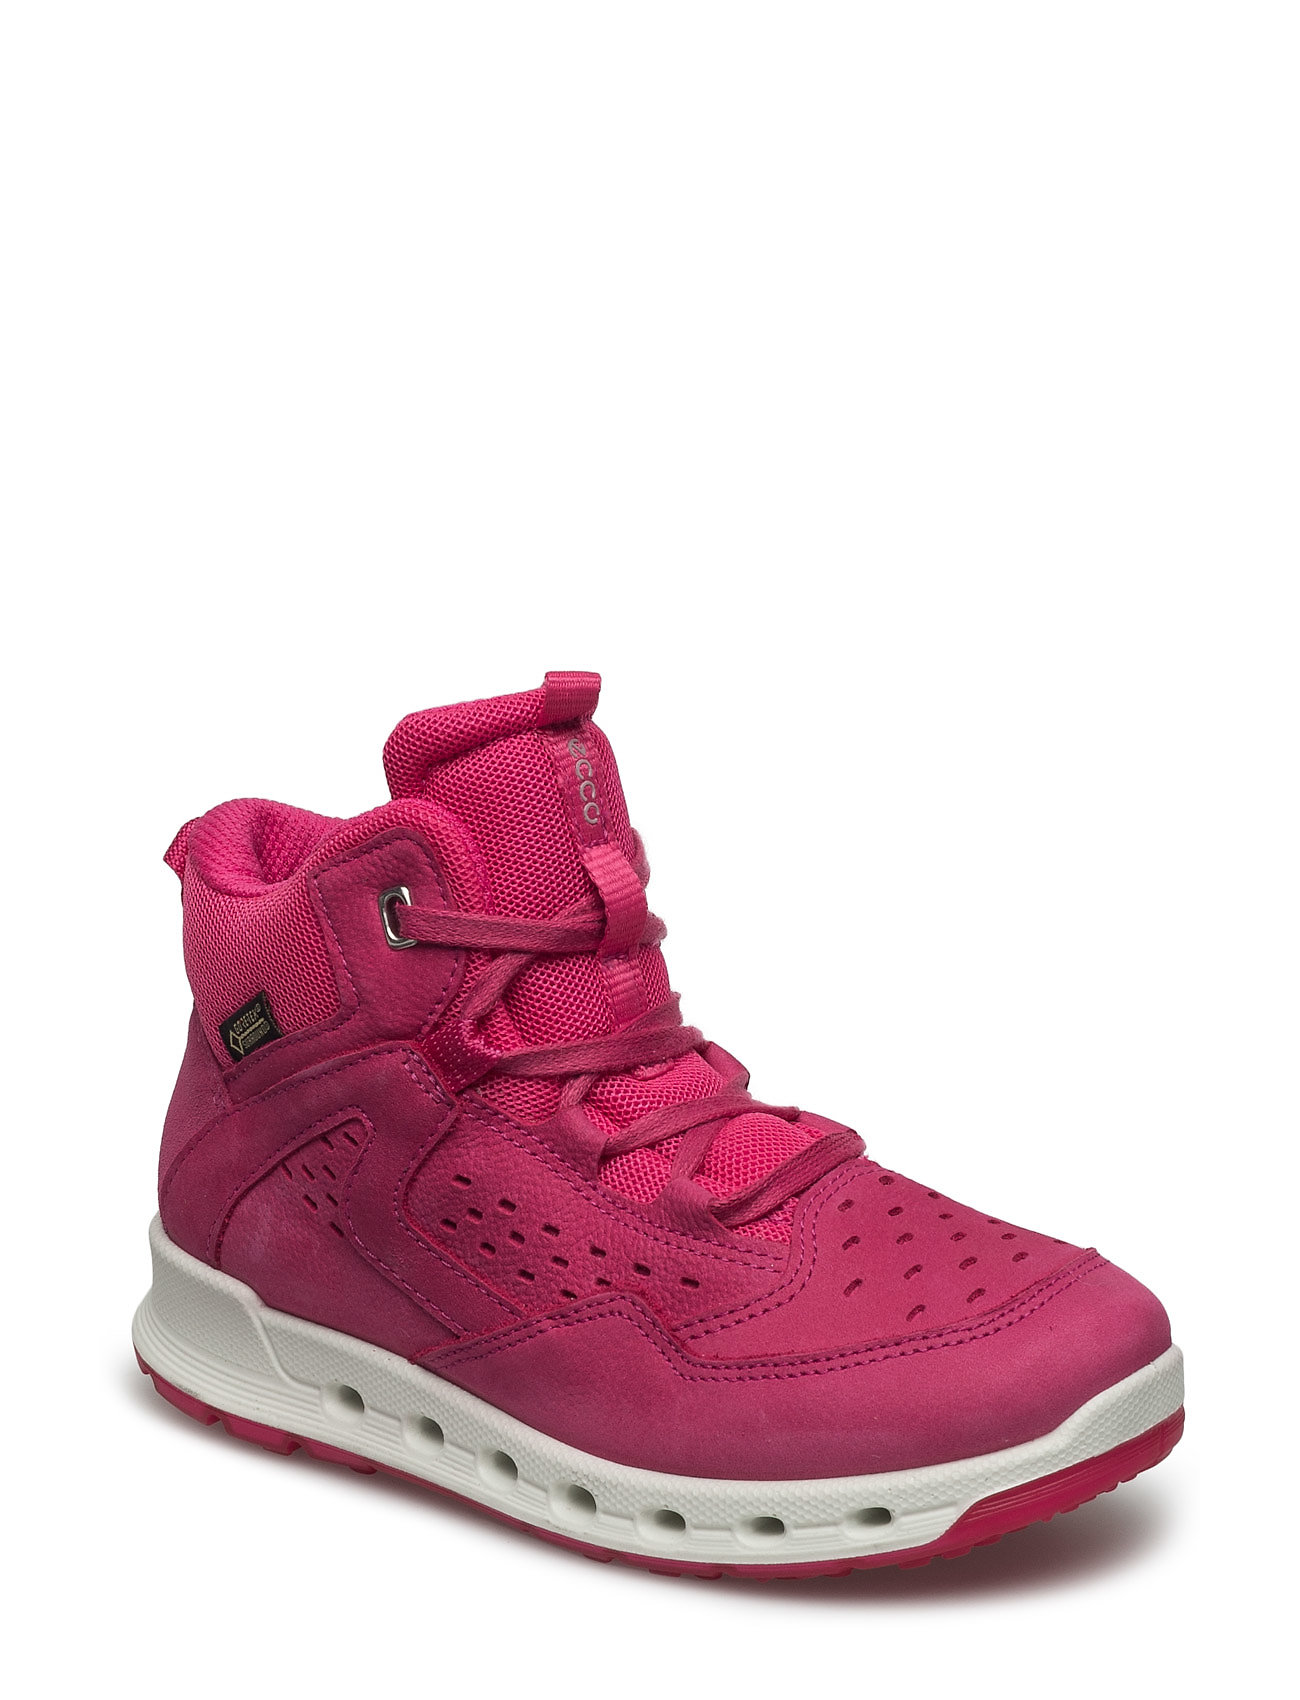 Cool Kids ECCO Sko & Sneakers til Børn i